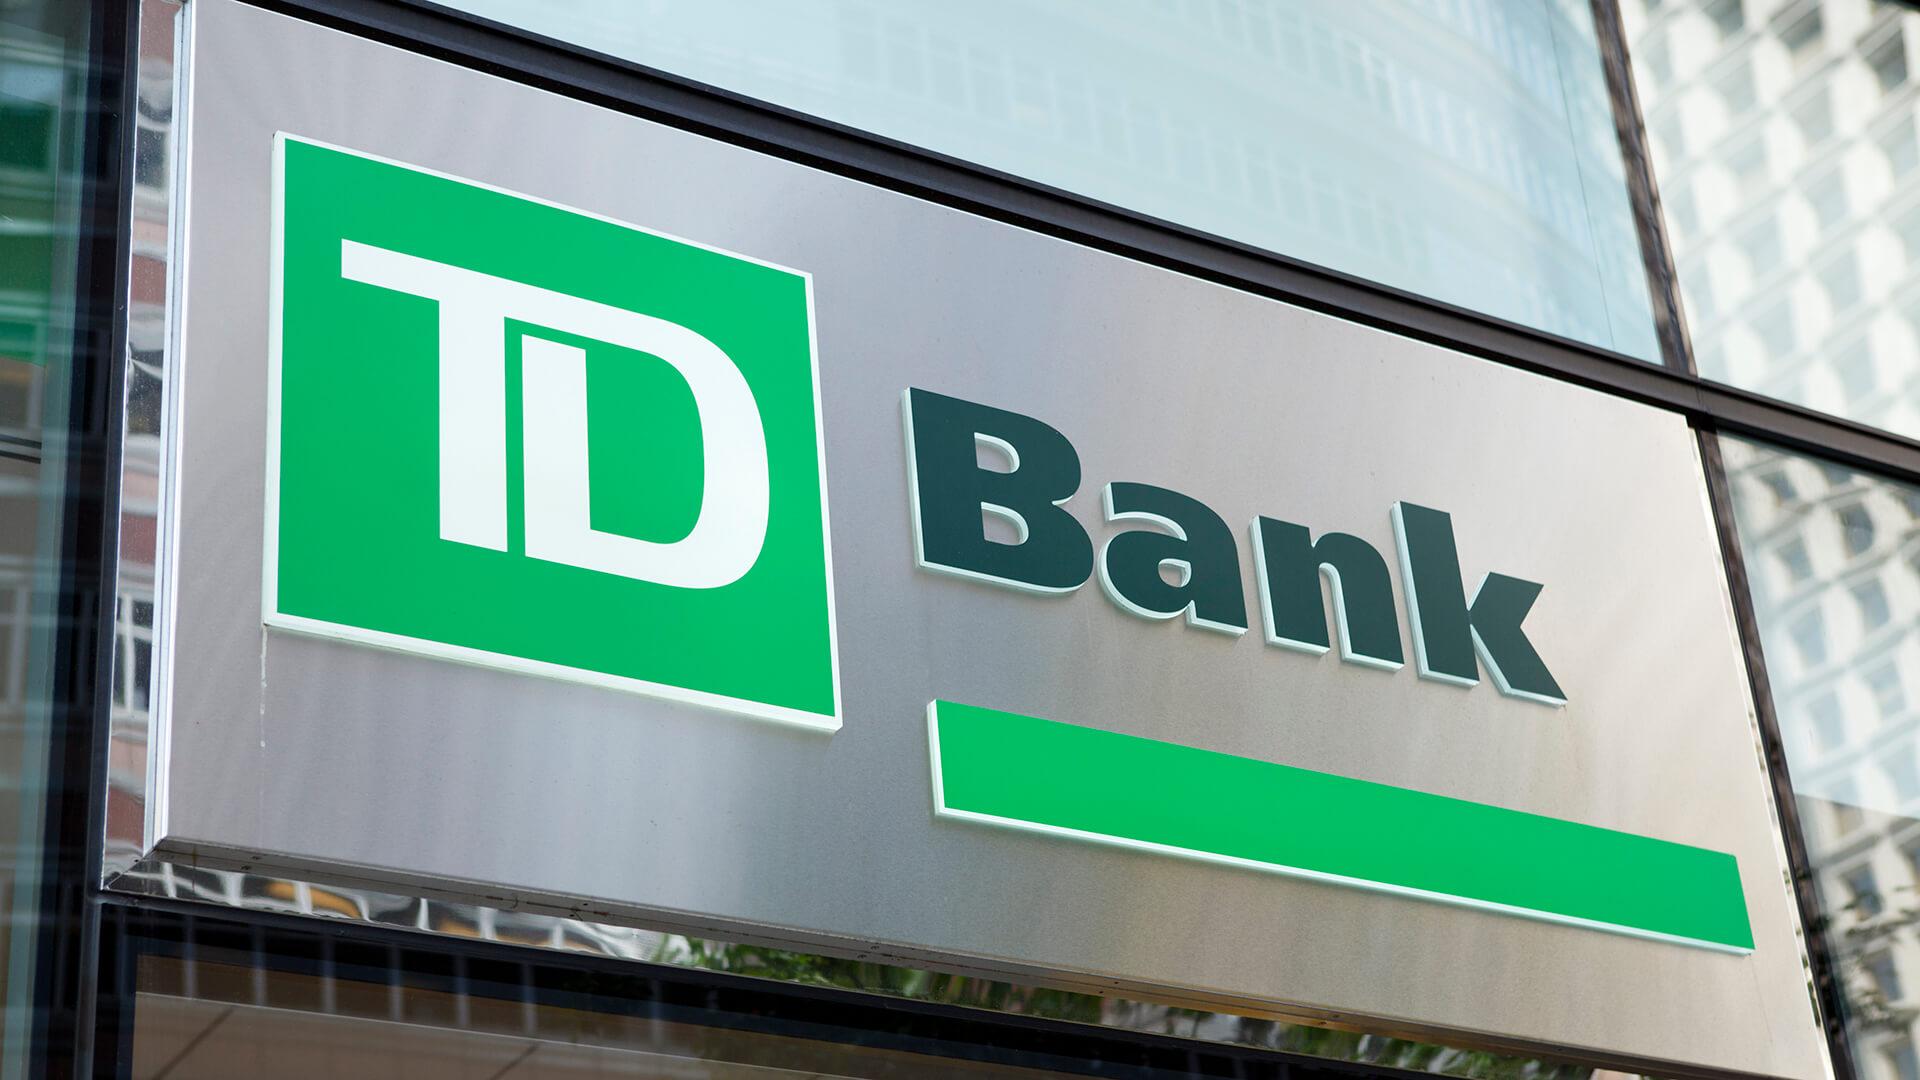 Td Bank Personal Loan Calculator